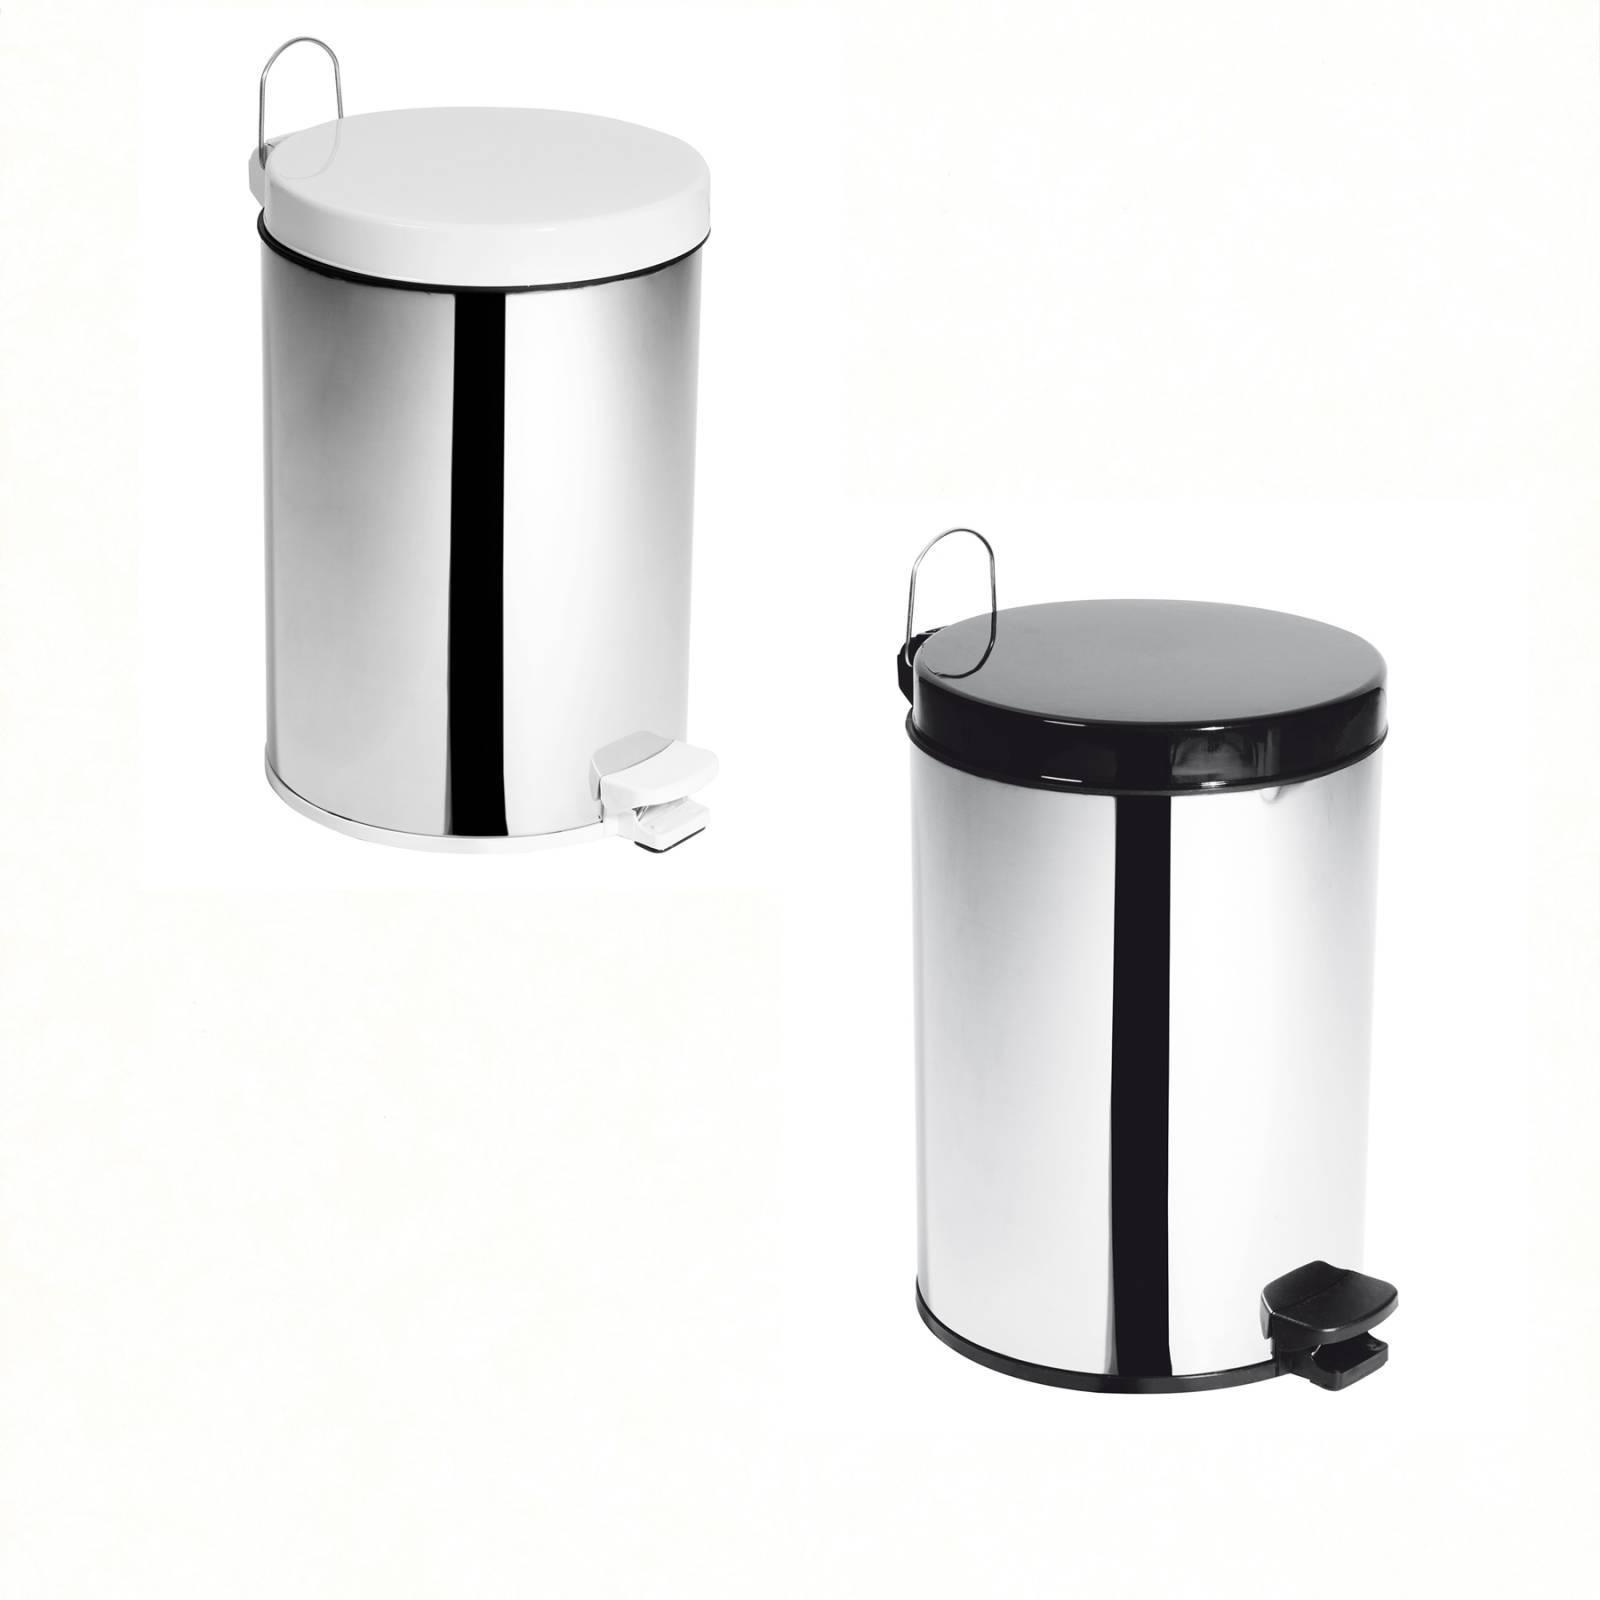 Lixeira Inox c/ Pedal e Balde Decorline - 10,5 Litros (Unidade)